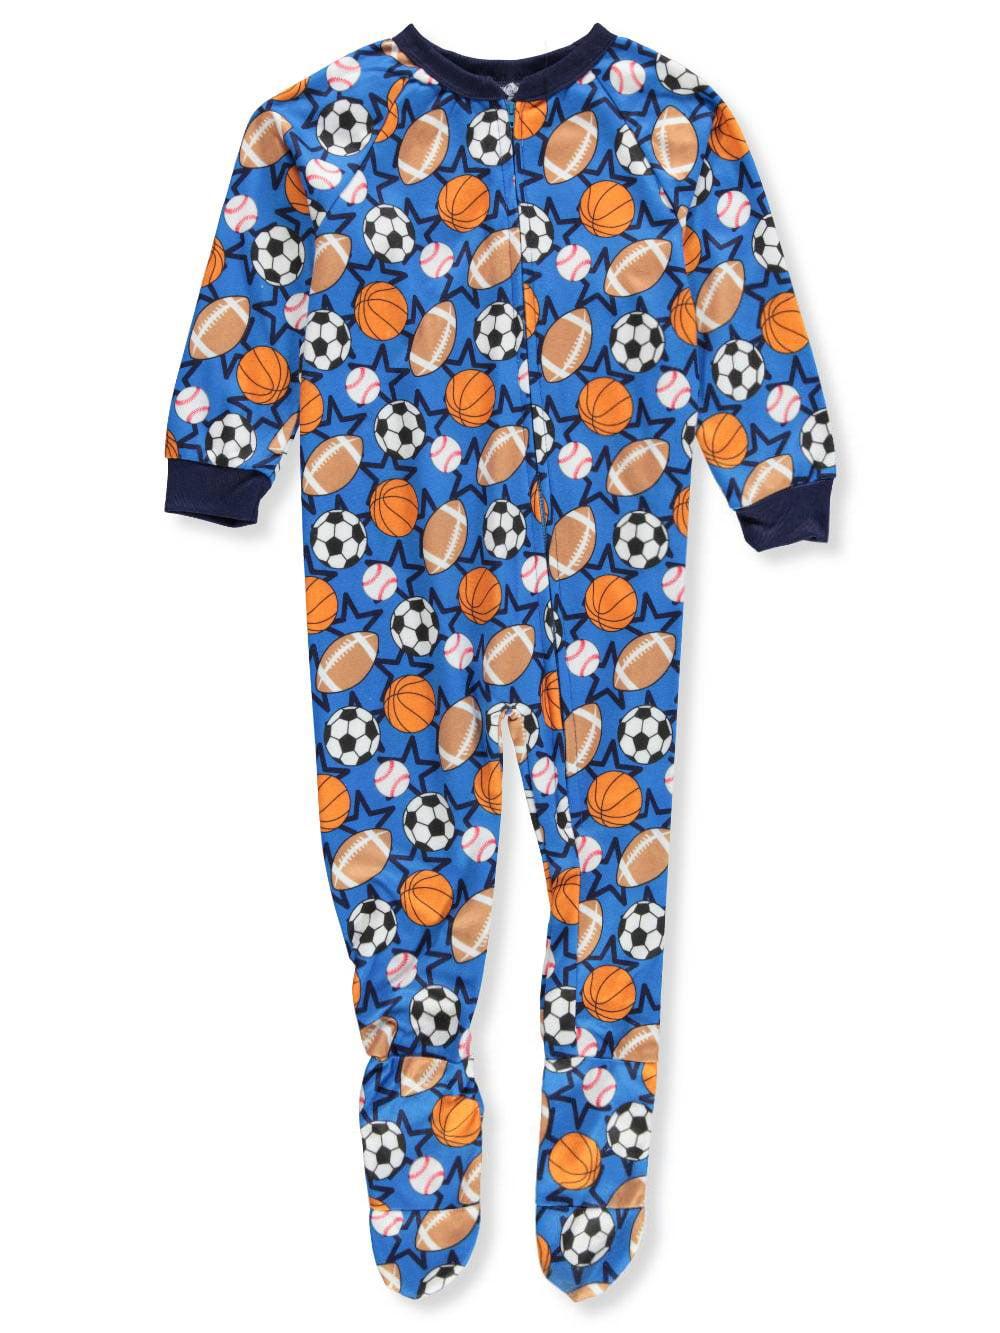 Quad Seven Boys' 1-Piece Footed Pajamas